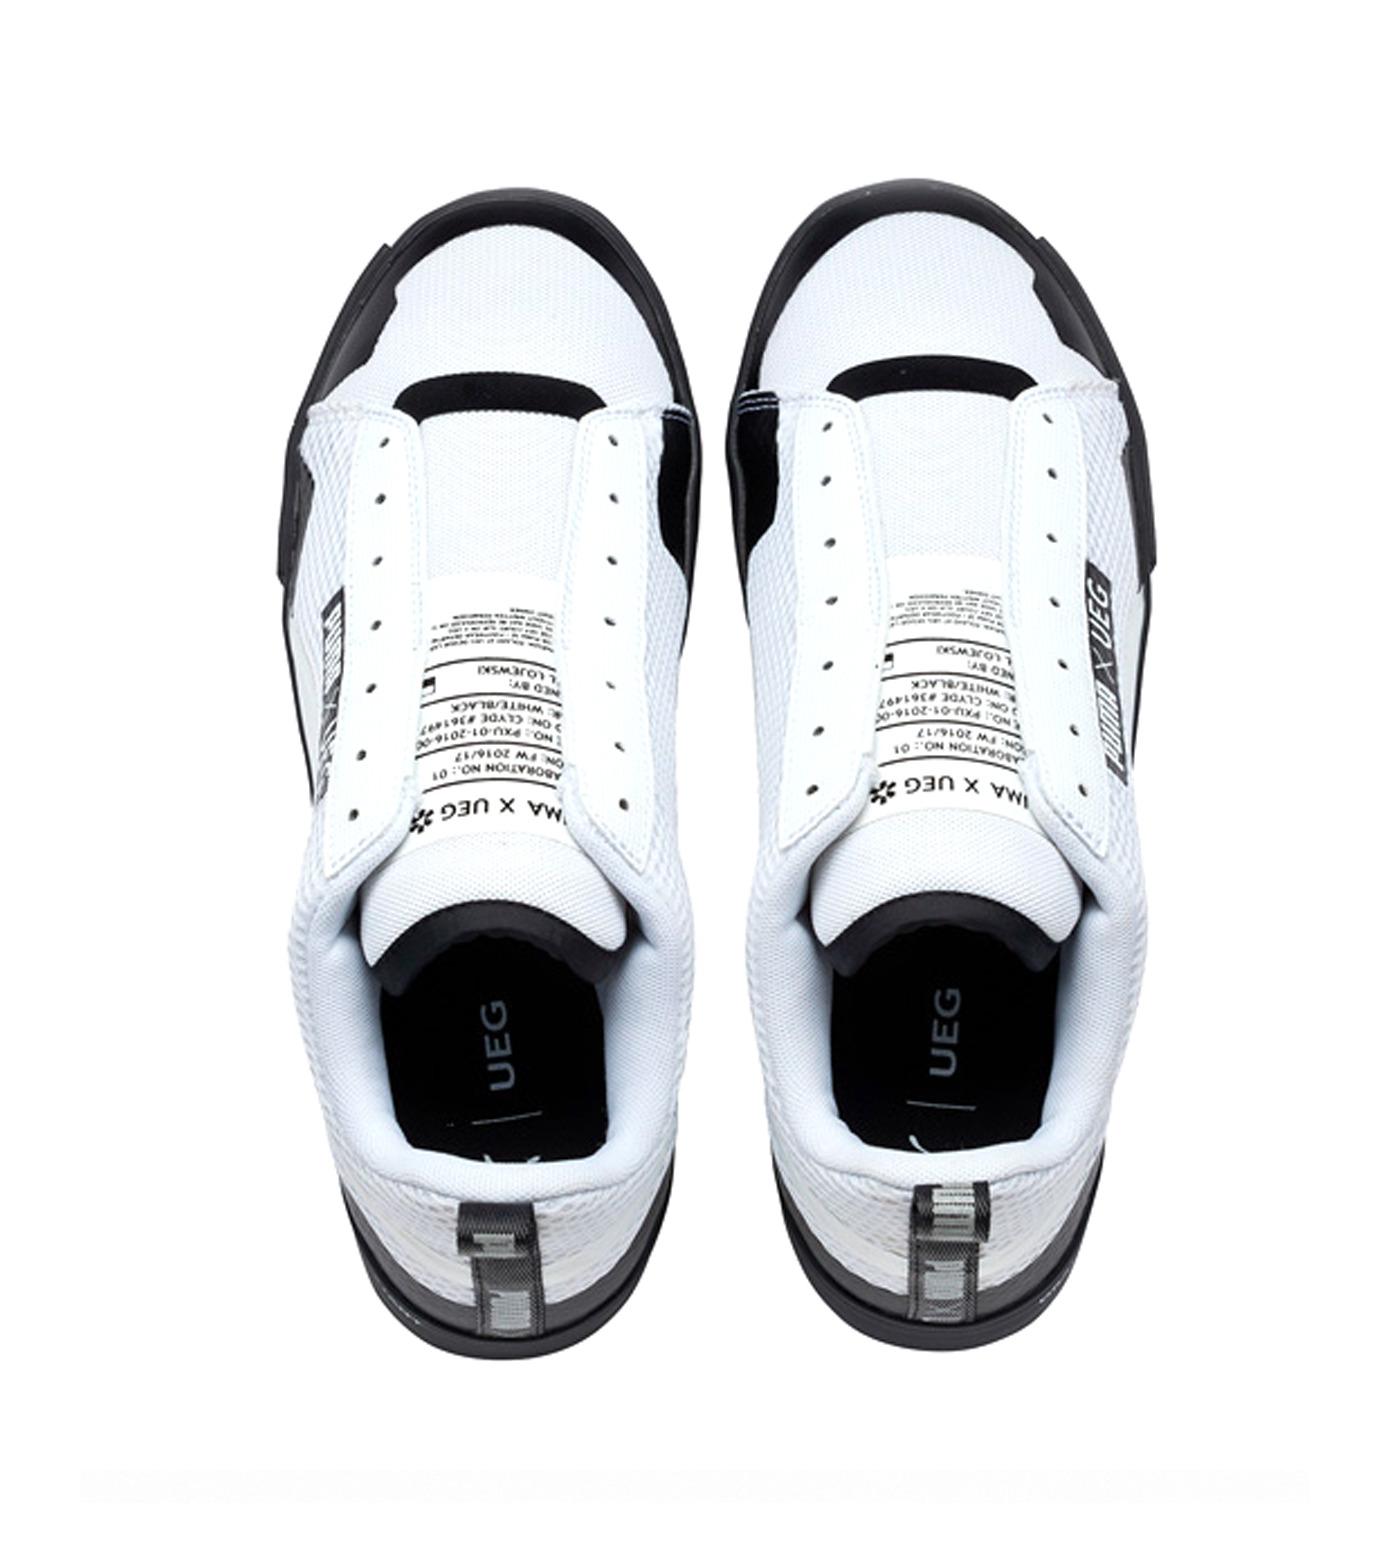 PUMA(プーマ)のCOURT PLAY SLIPON X UEG-WHITE(シューズ/shoes)-361637-4 拡大詳細画像3